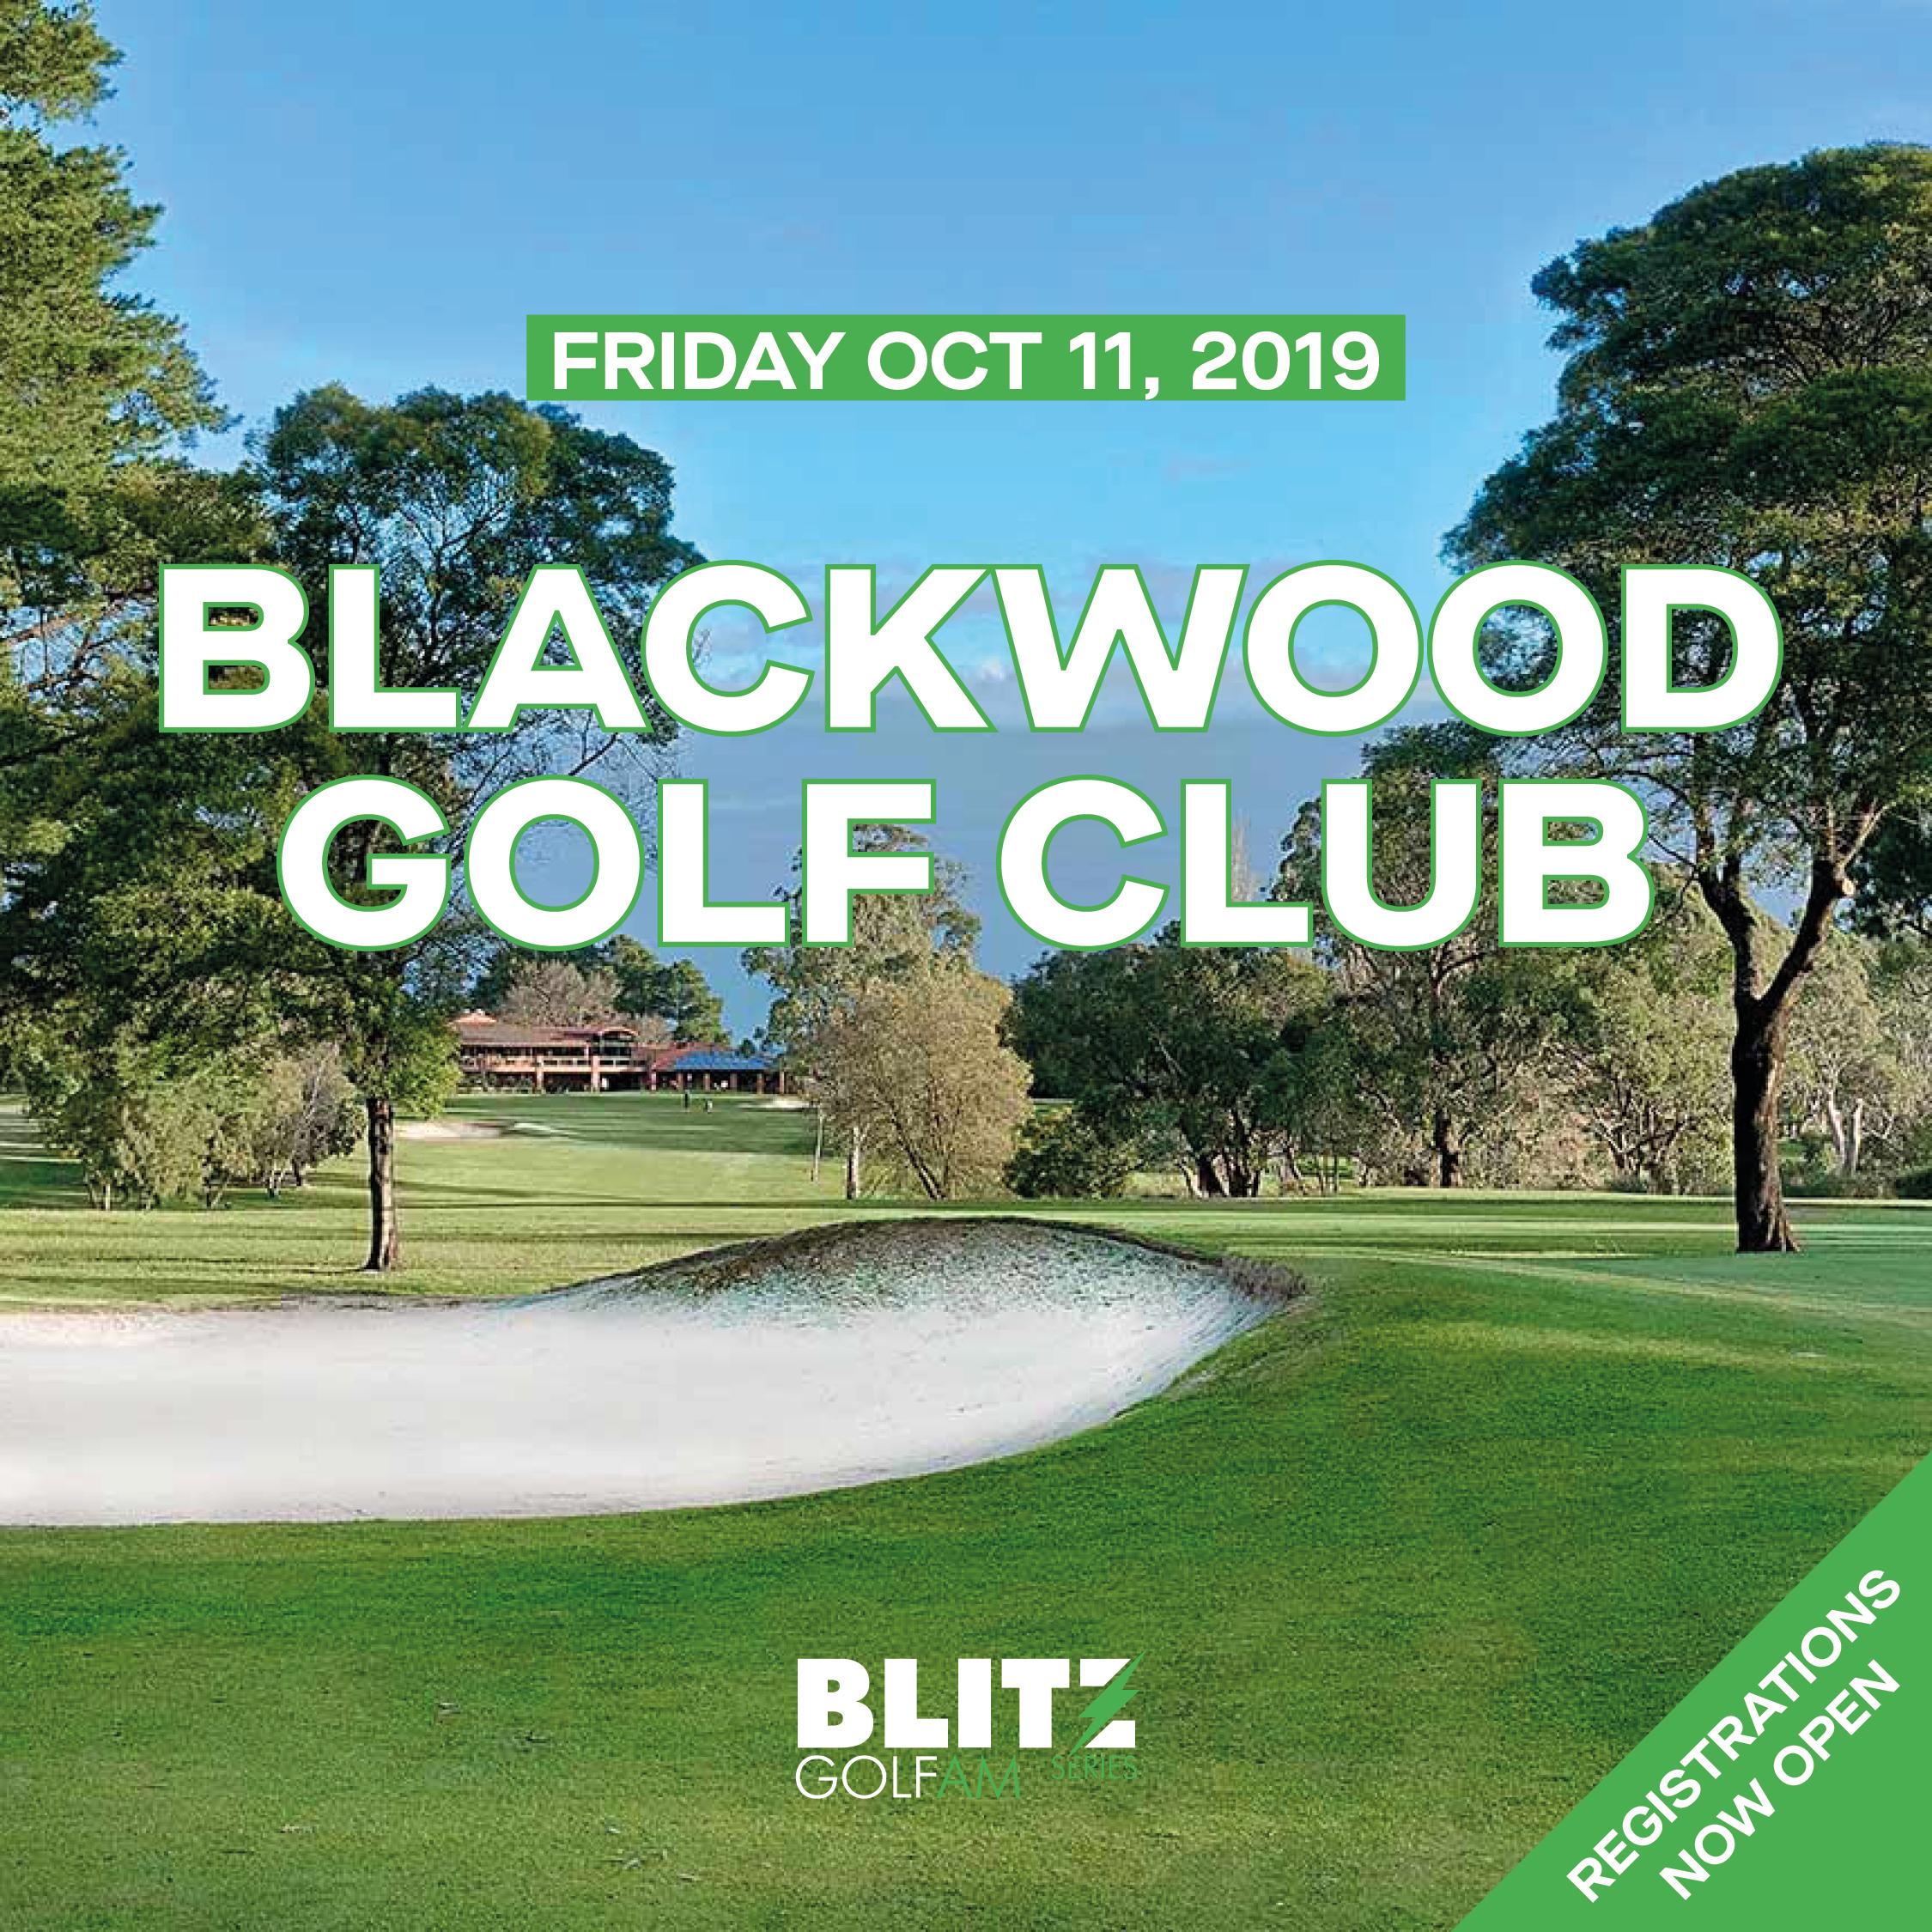 SANT_Blackwood_Blitz 2020_AM Series Launch_111019.jpg